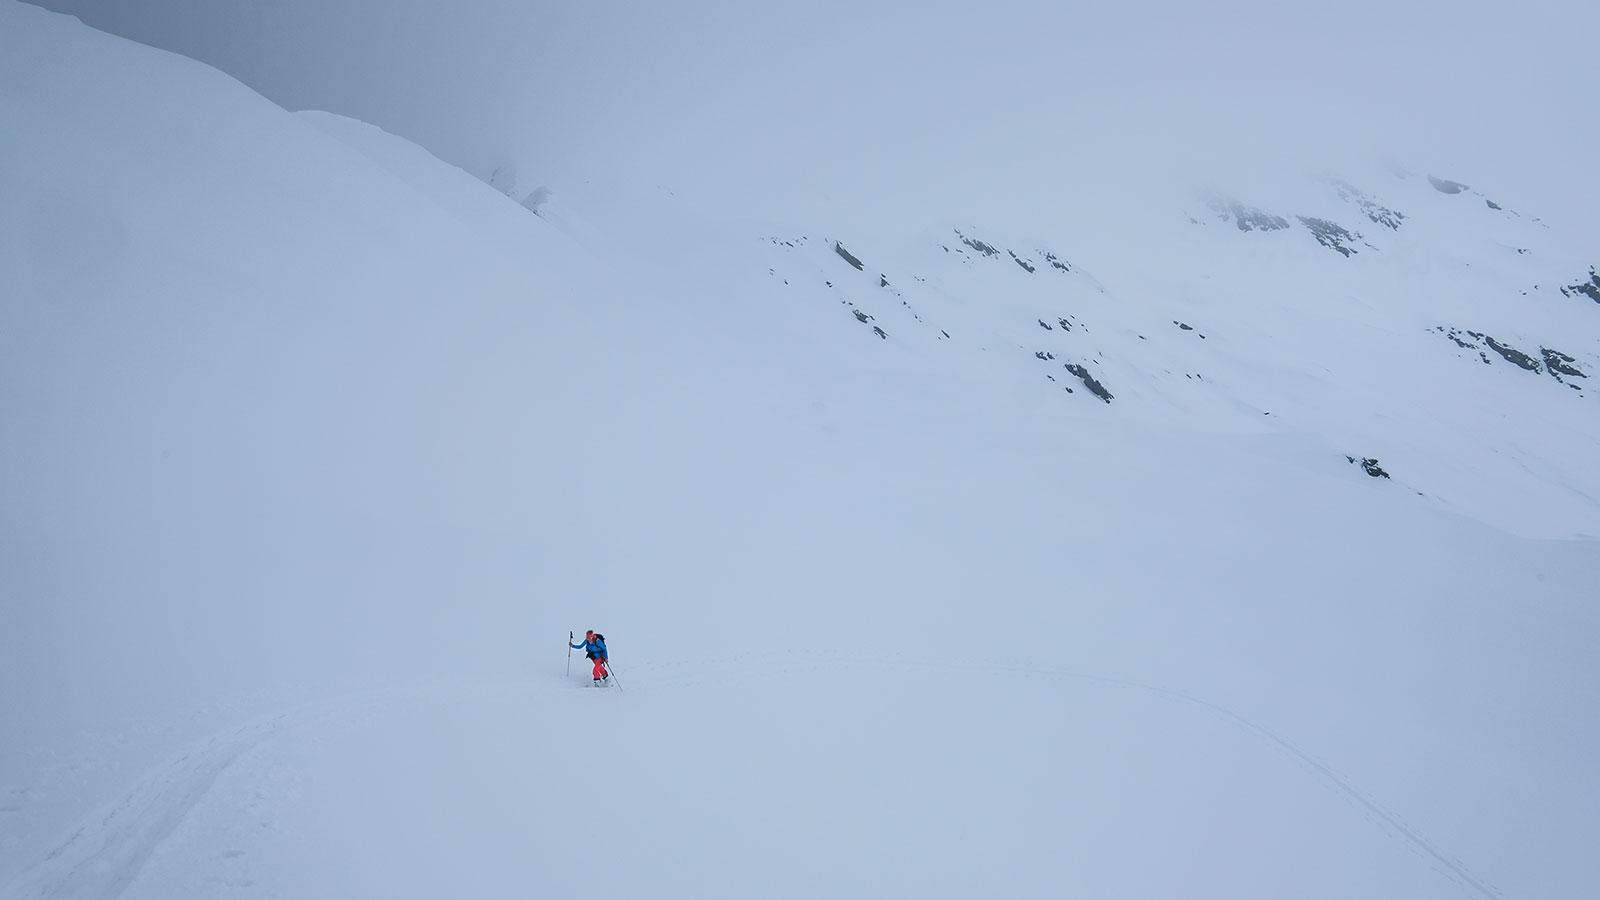 Warten im Nebel. Skitour in Südtirol | Pauli Trenkwalder, Berge & Psychologie